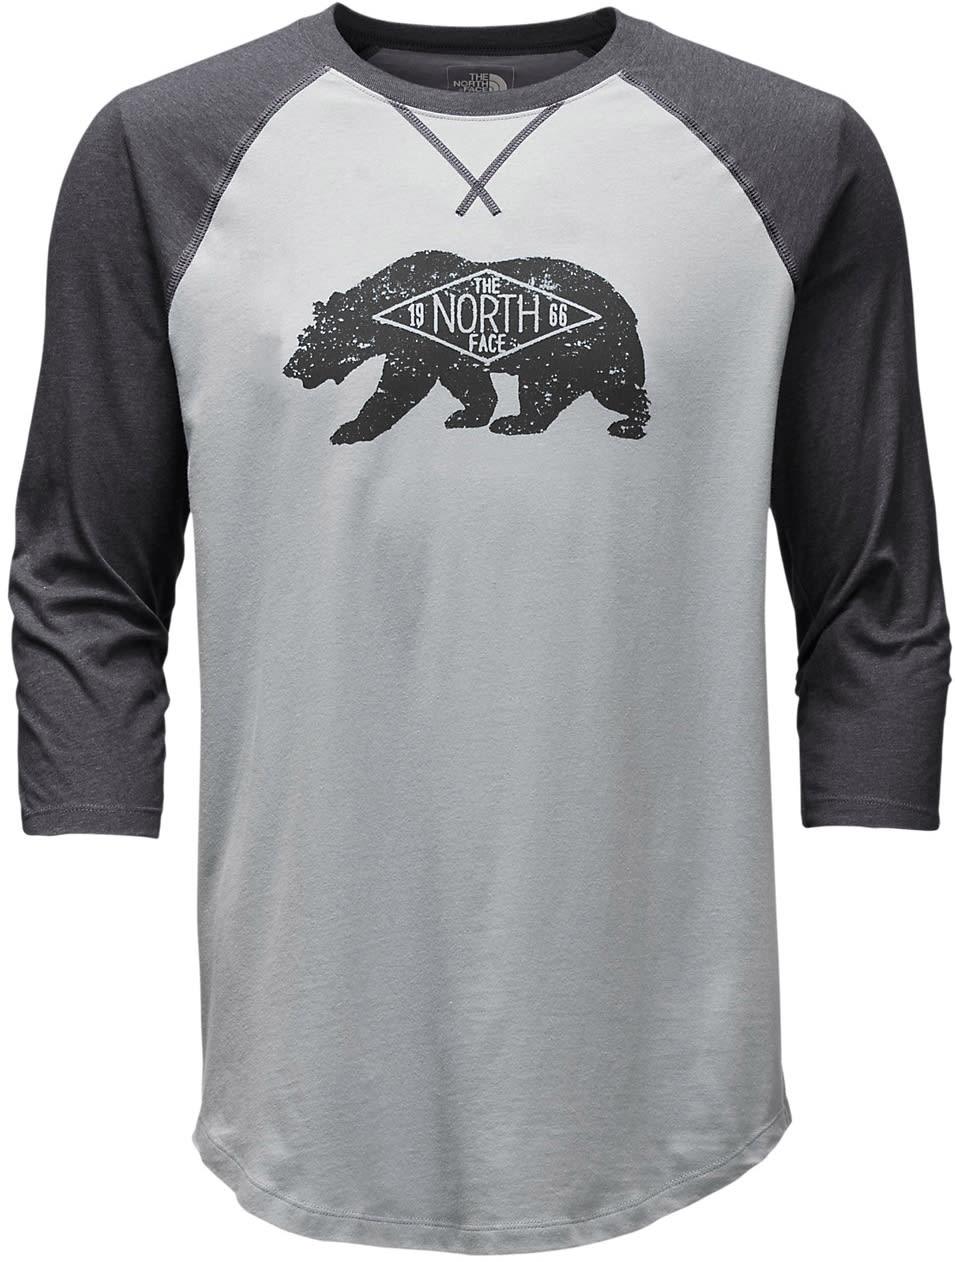 The North Face Heritage Bear Cub 3/4 Sleeve Raglan nf3hbc3s02tmgh17zz-the-north-face-shirts-polos